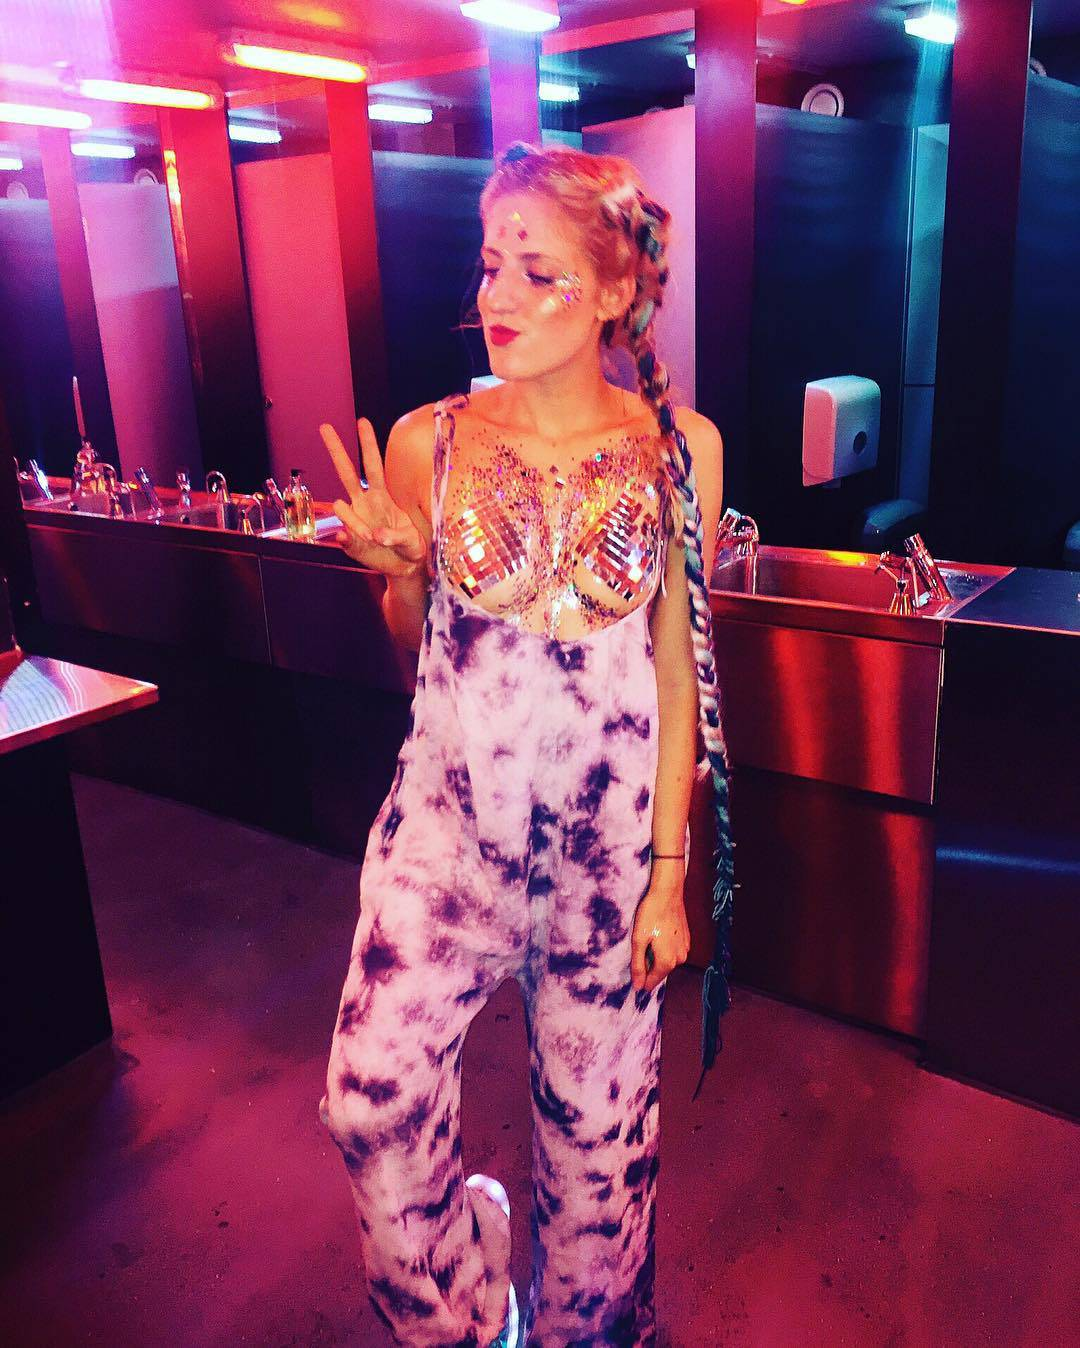 Новый тренд в Instagram - Glitter Boobs (20 фото)